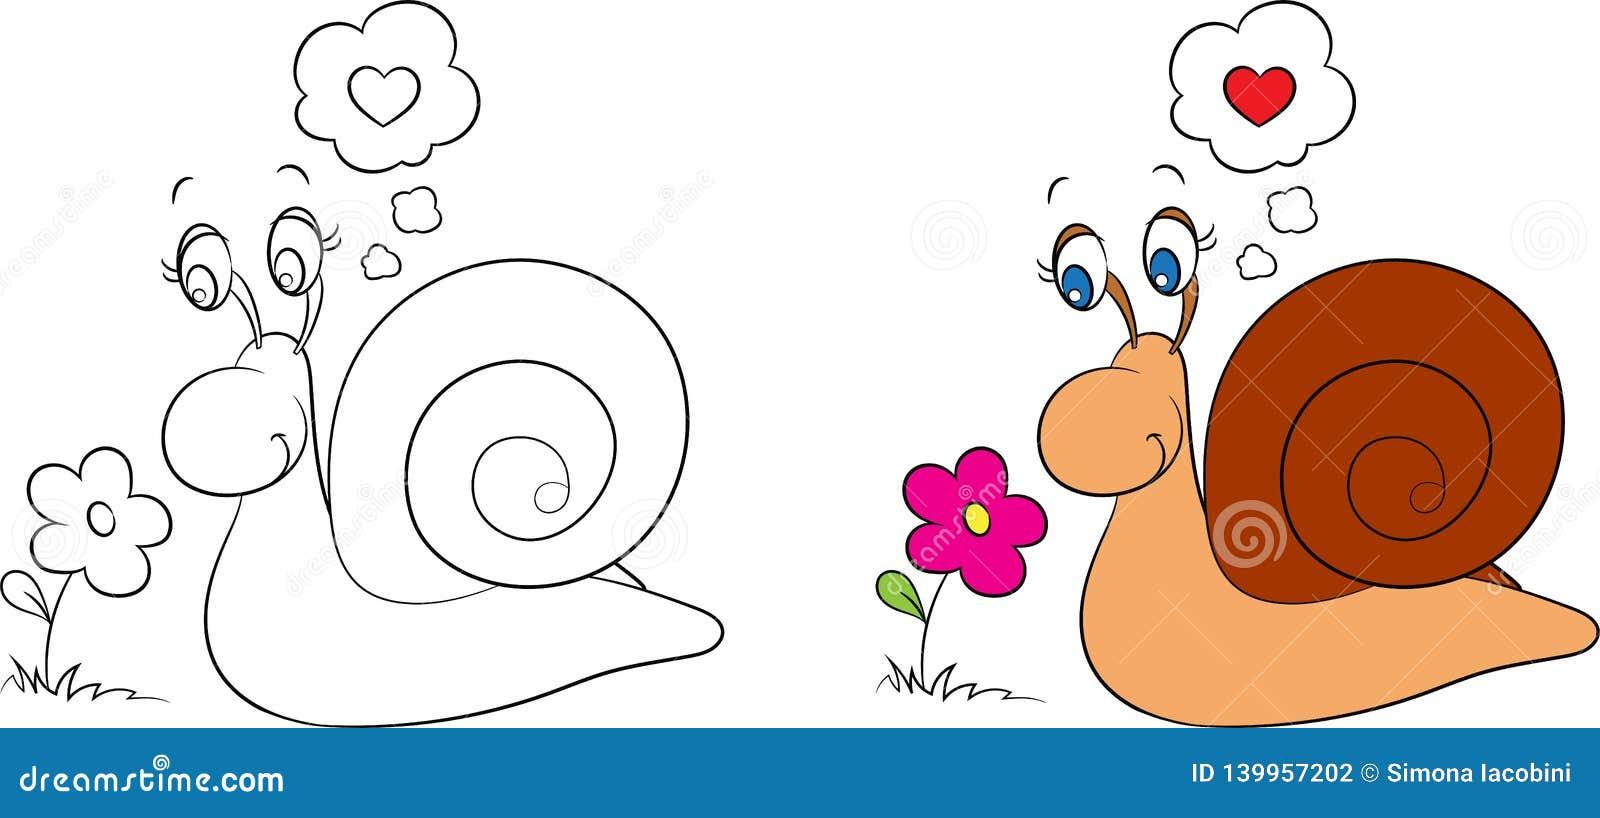 Avant Et Apres Le Dessin De Kawaii D Un Petit Escargot Regardant Une